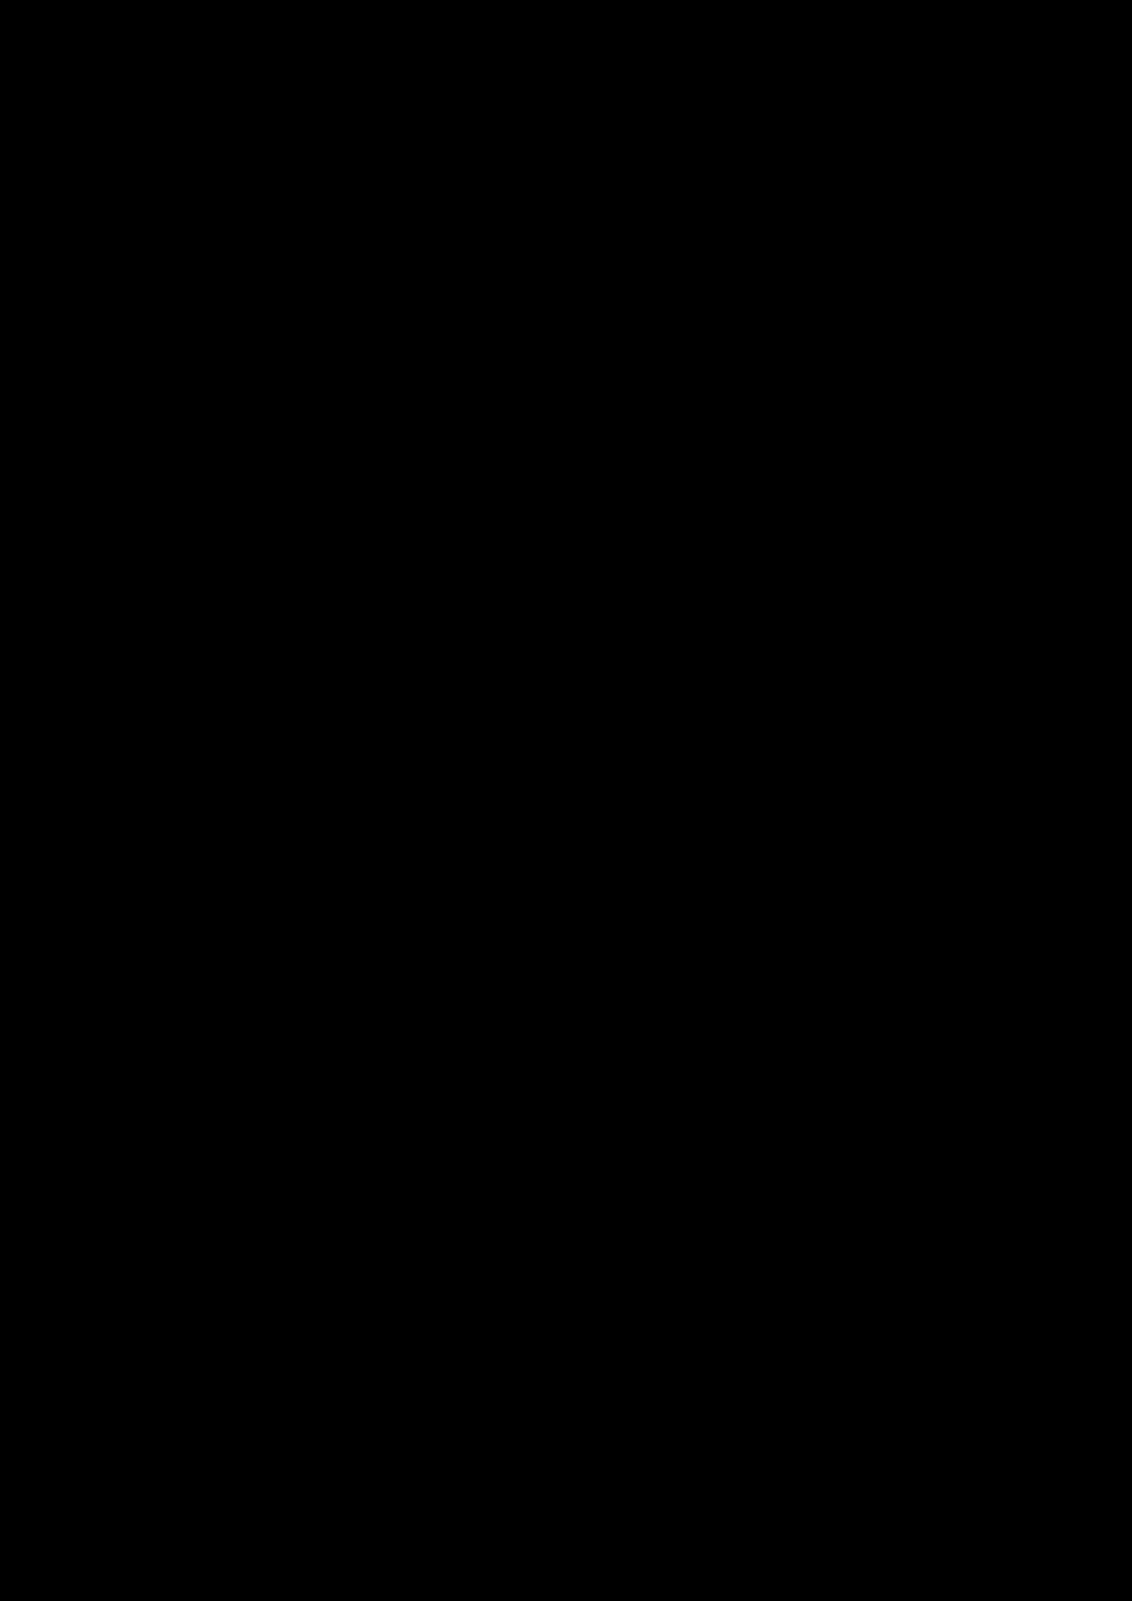 Romans o sleze slide, Image 36